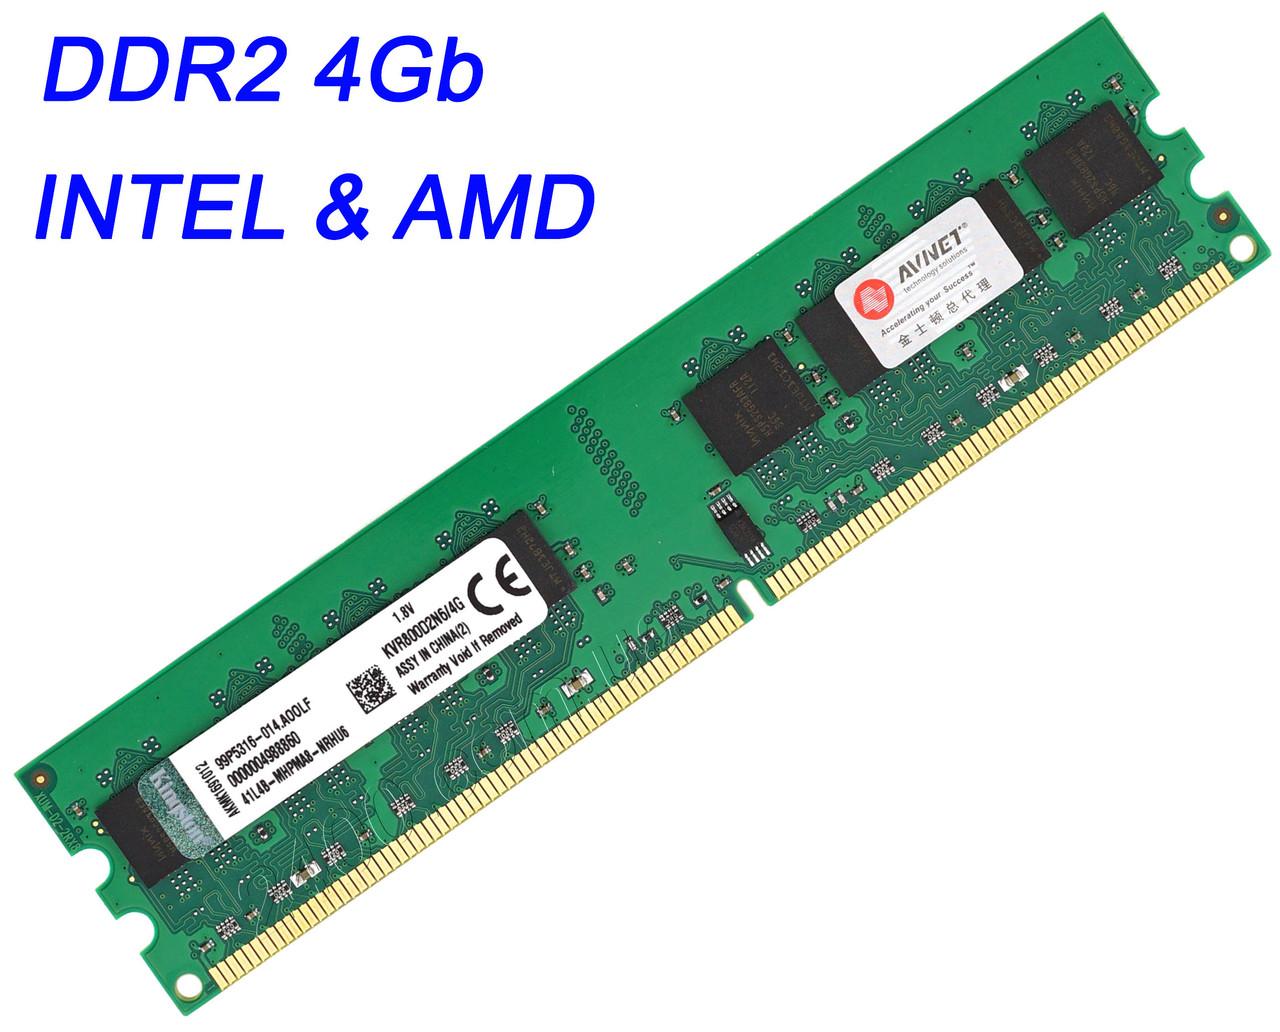 Оперативная память ДДР2 4 Гб (DDR2 4GB) Intel и AMD KVR800D2N6/4G 800MHz — универсальная ОЗУ 4096MB